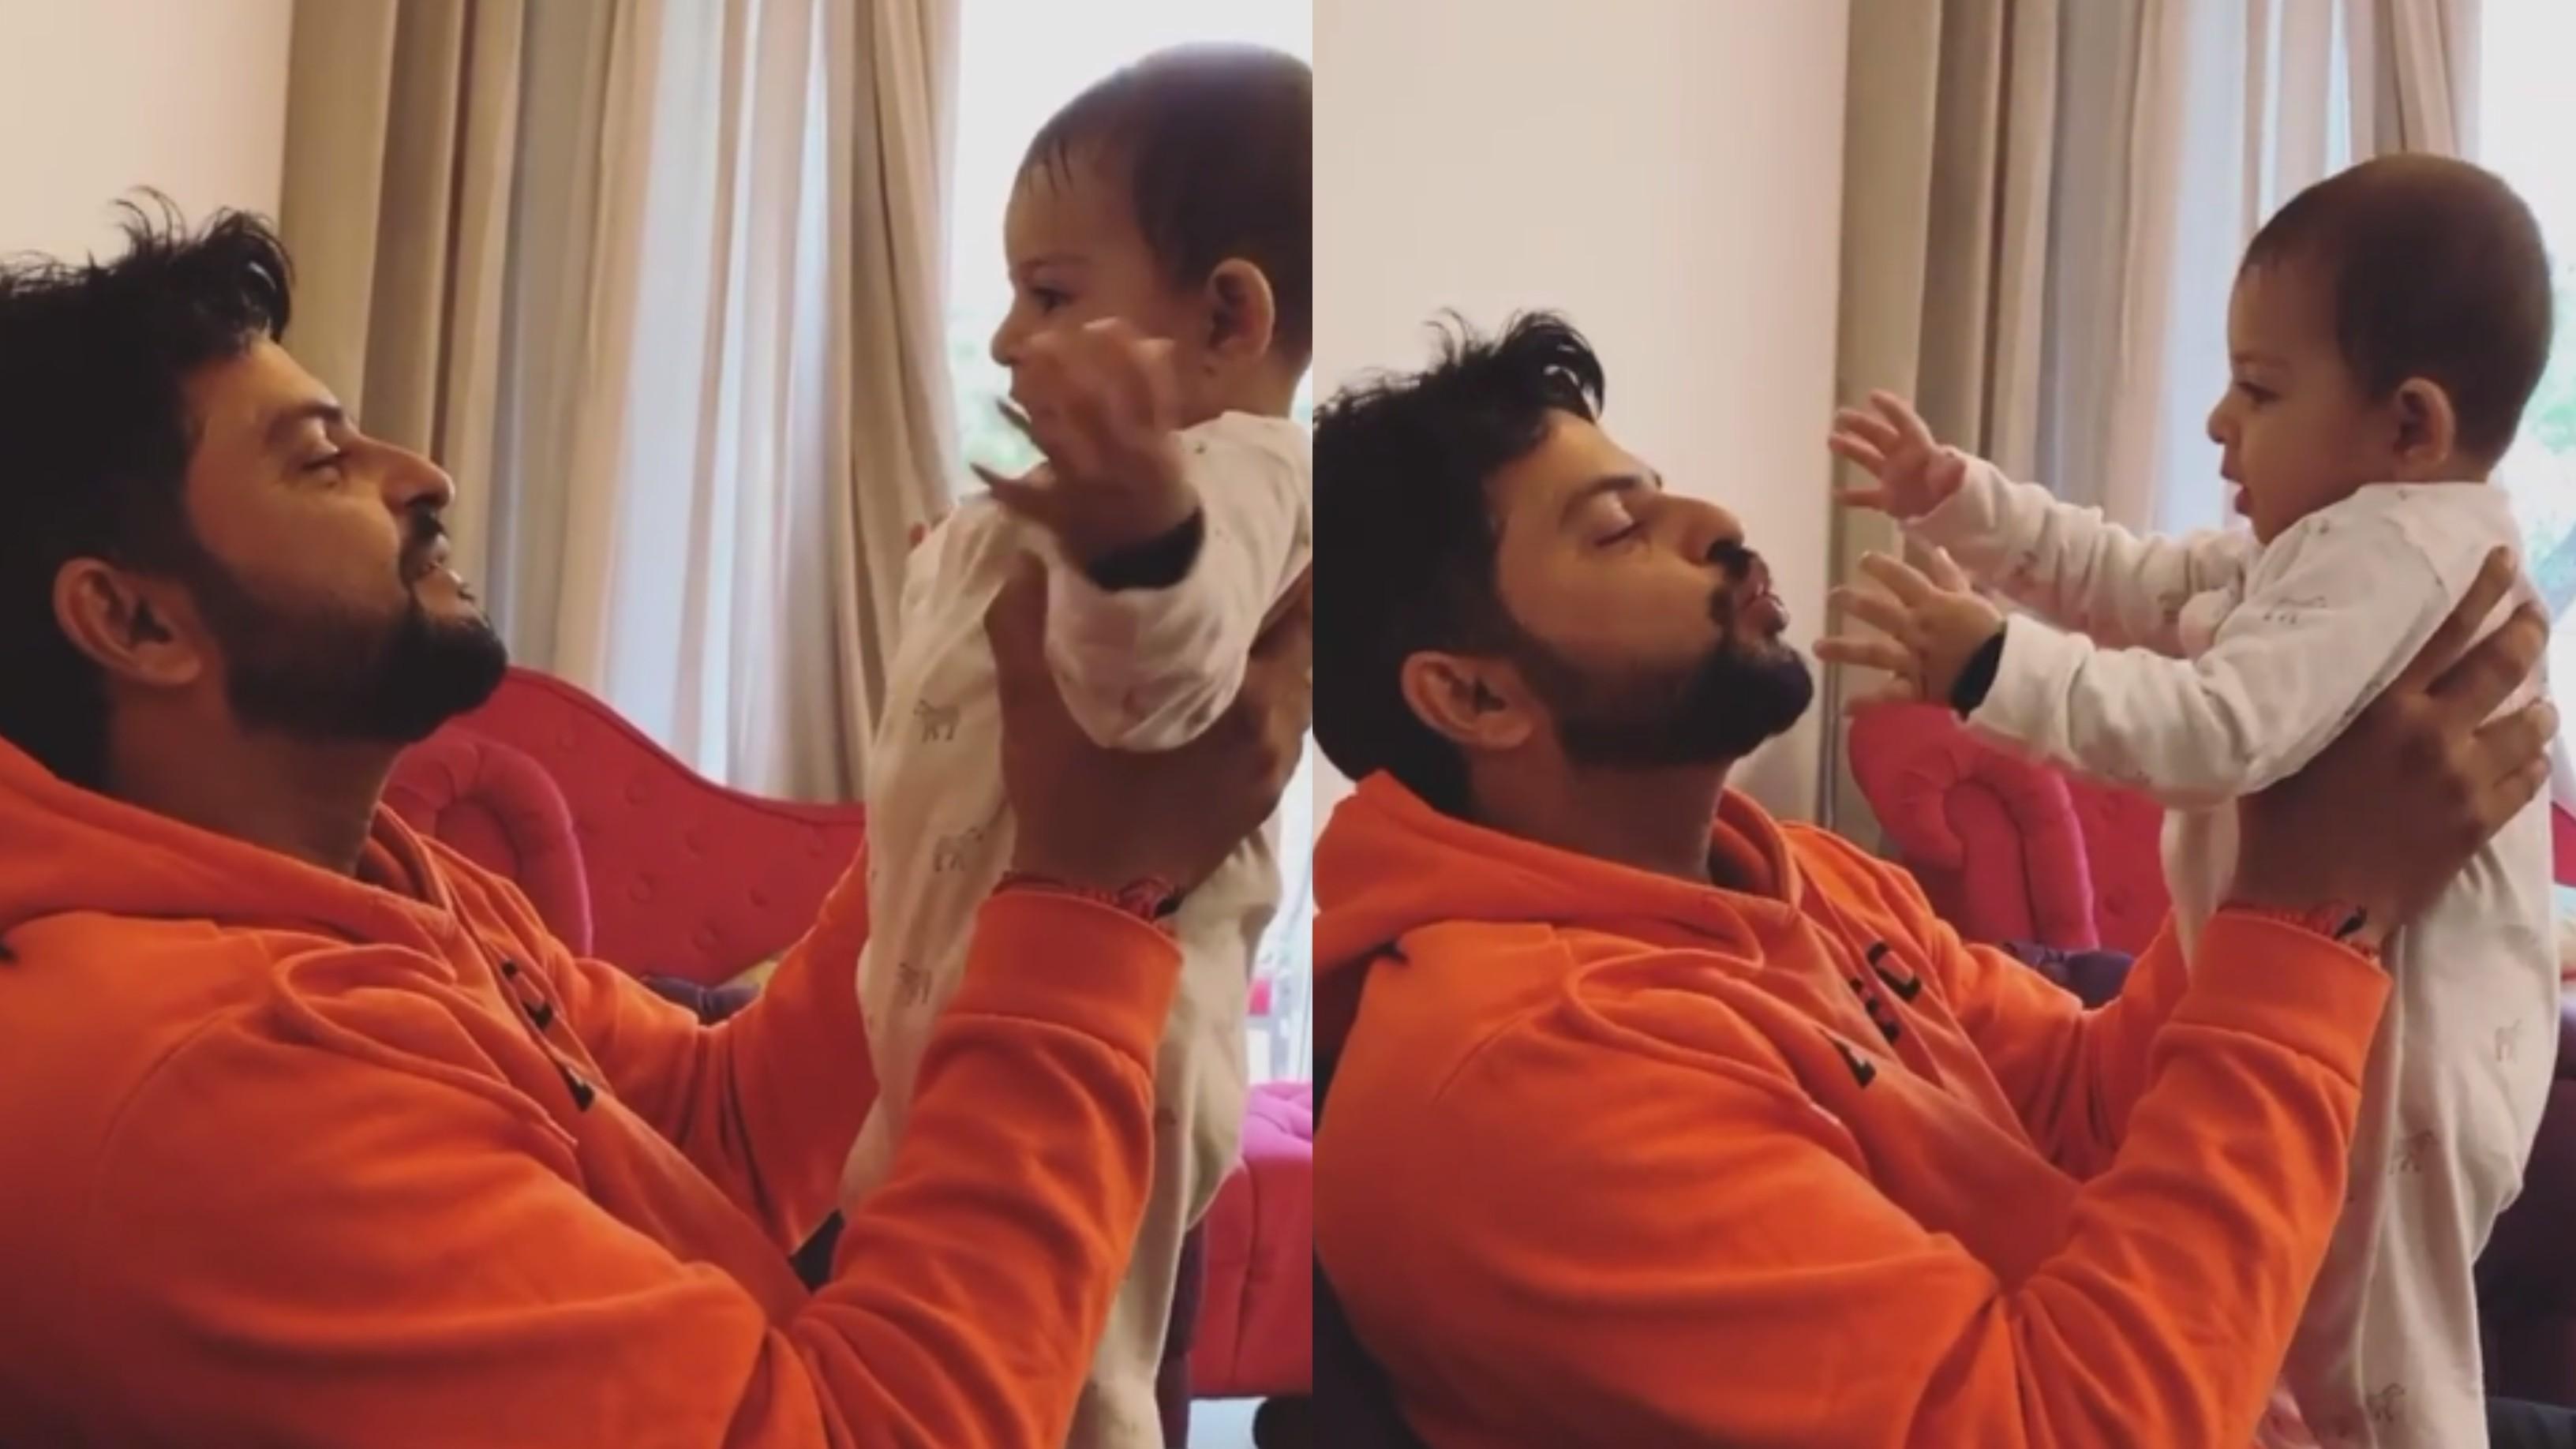 WATCH - Suresh Raina shares adorable video with son Rio; calls him his